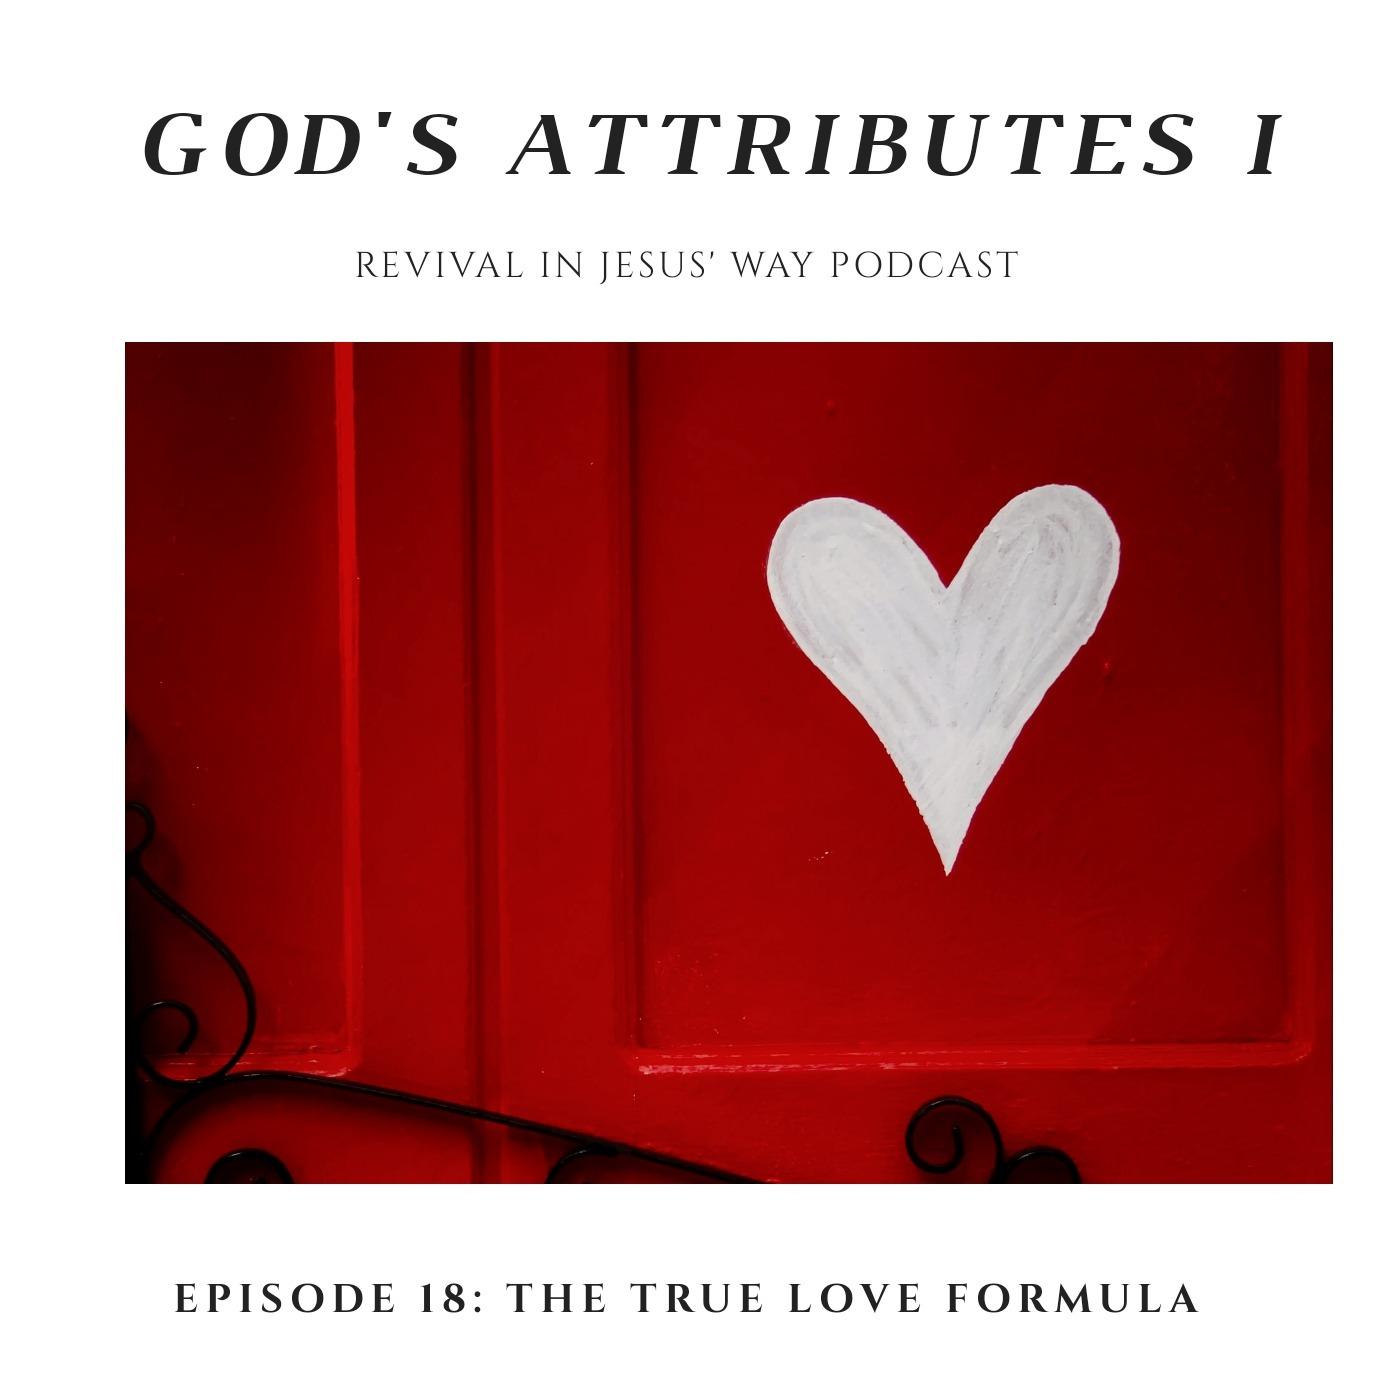 Podcast 18: Foundation Seven: Test Love Through the True Love Formula; Understanding God's attributes 1